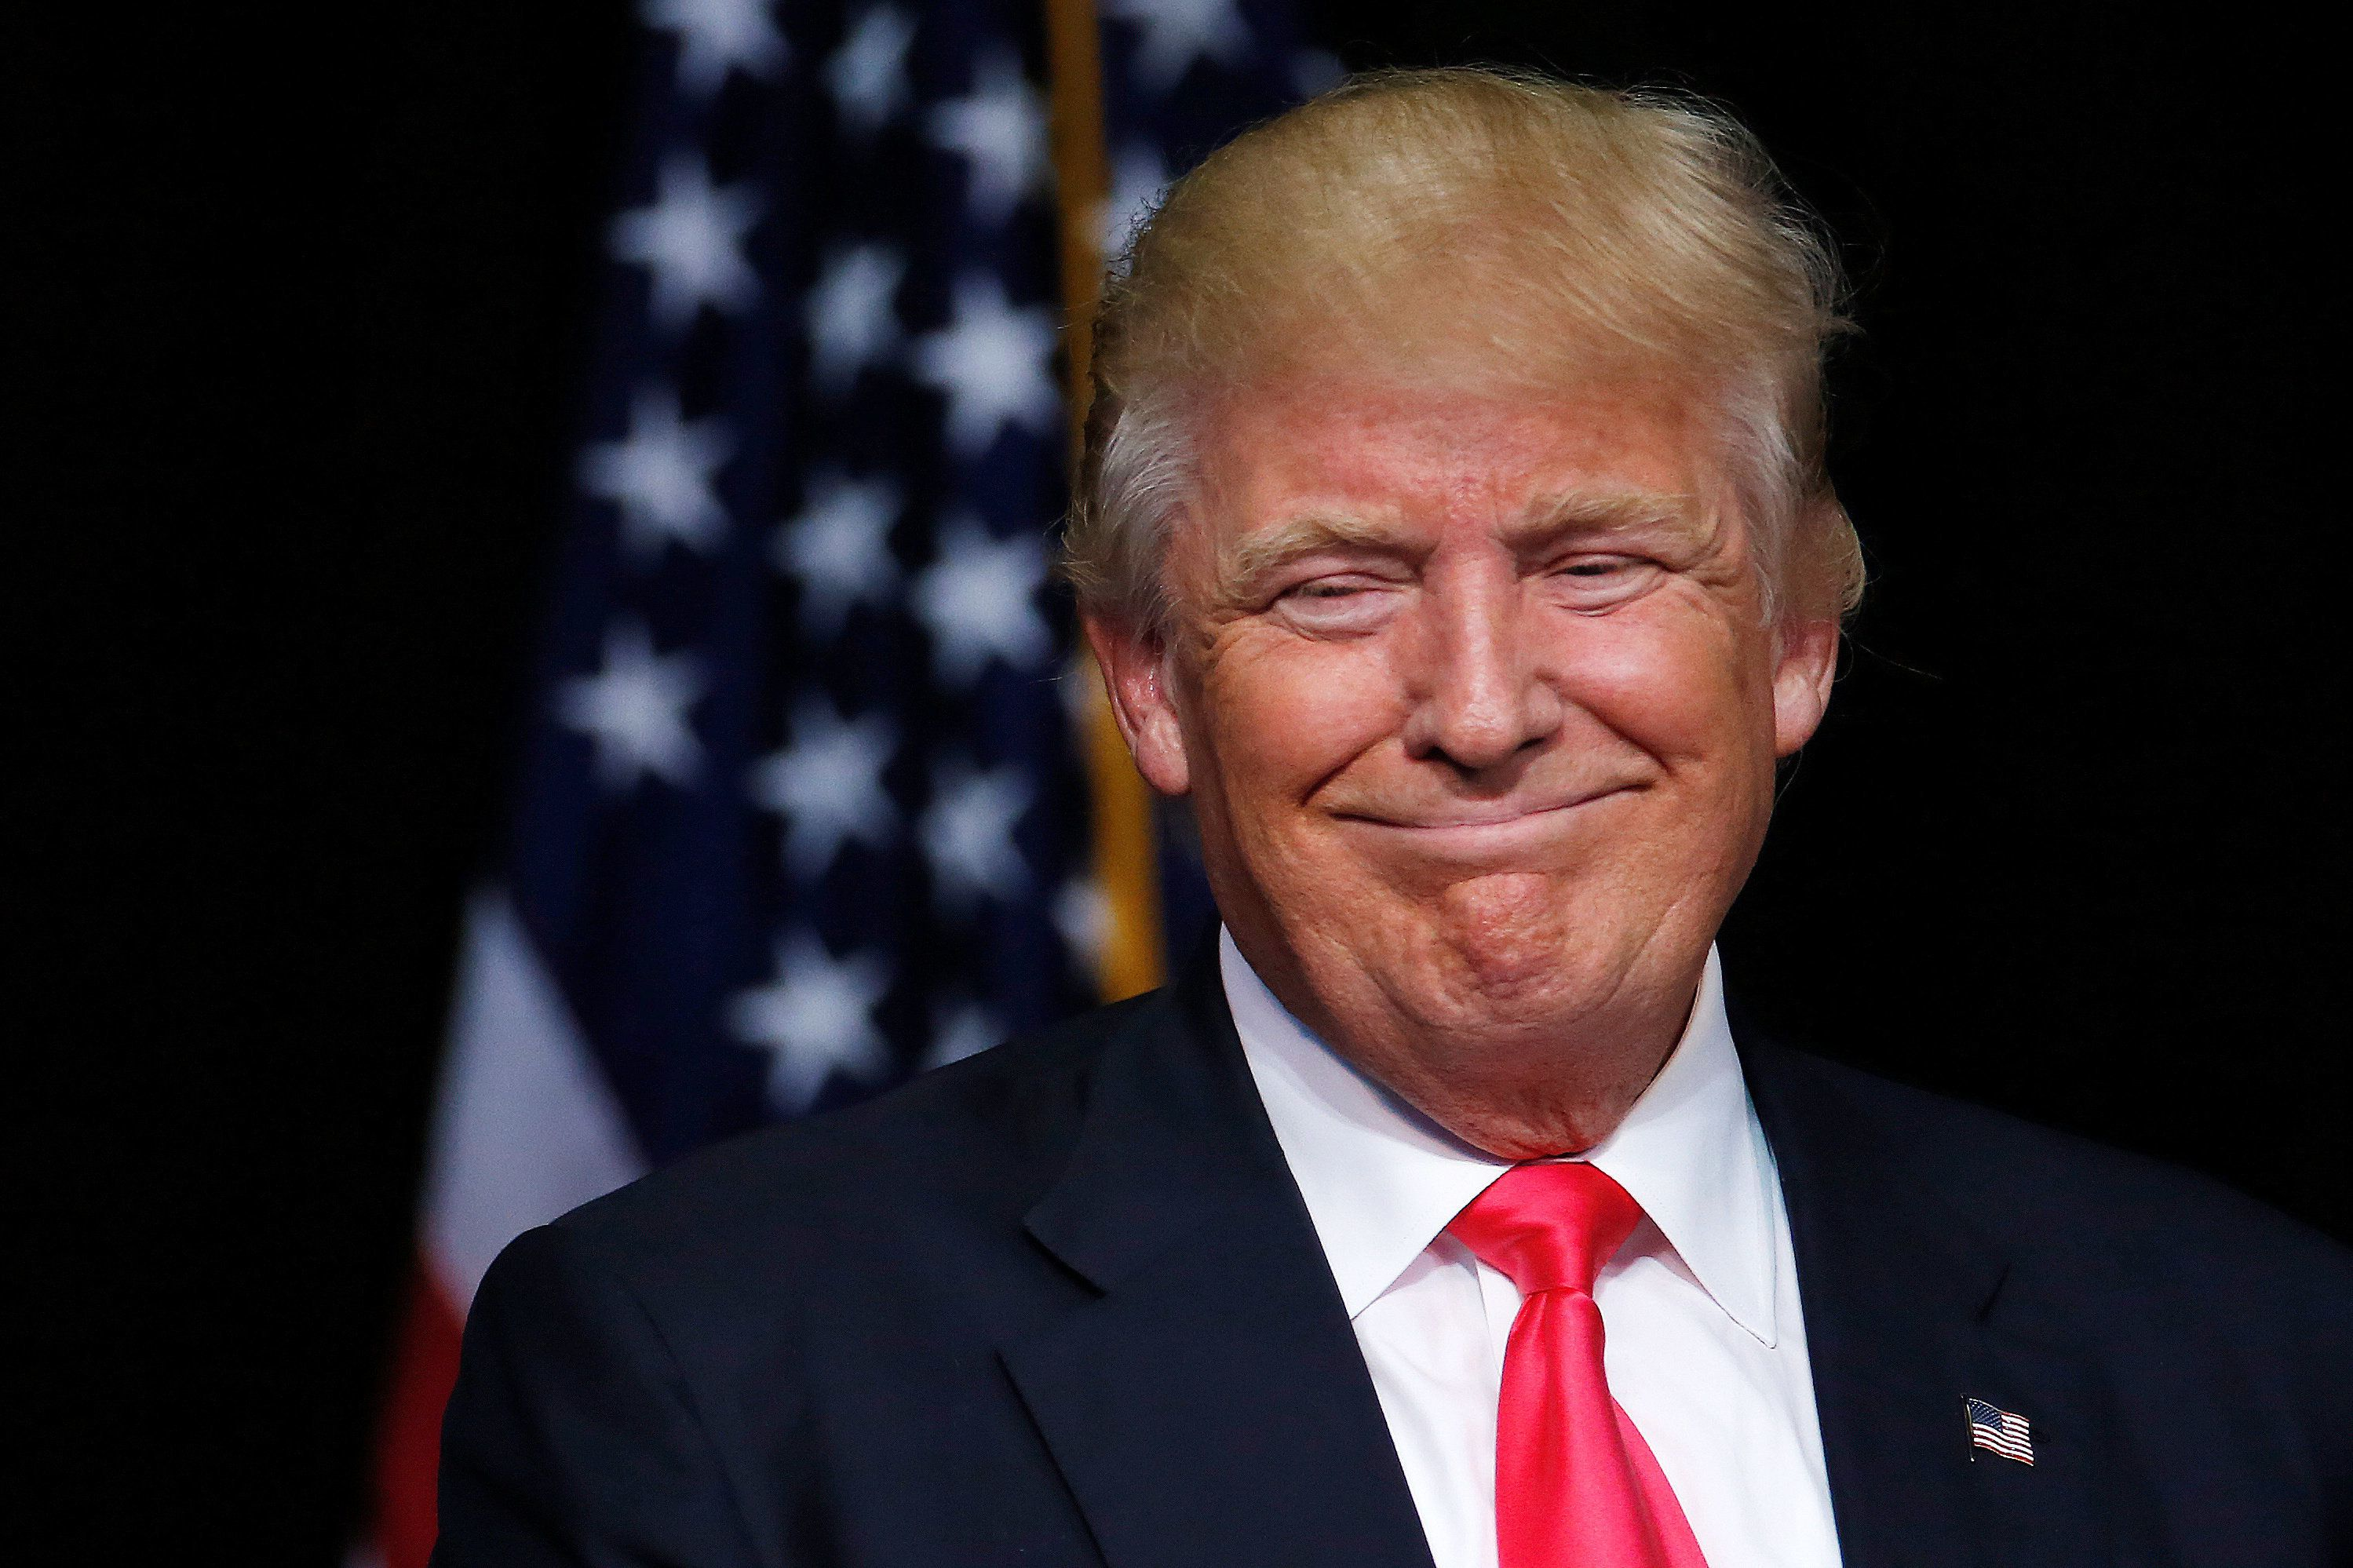 Republican presidential nominee Donald Trump speaks at a campaign rally in Scranton, Pennsylvania, U.S., July 27, 2016.  REUTERS/Carlo Allegri